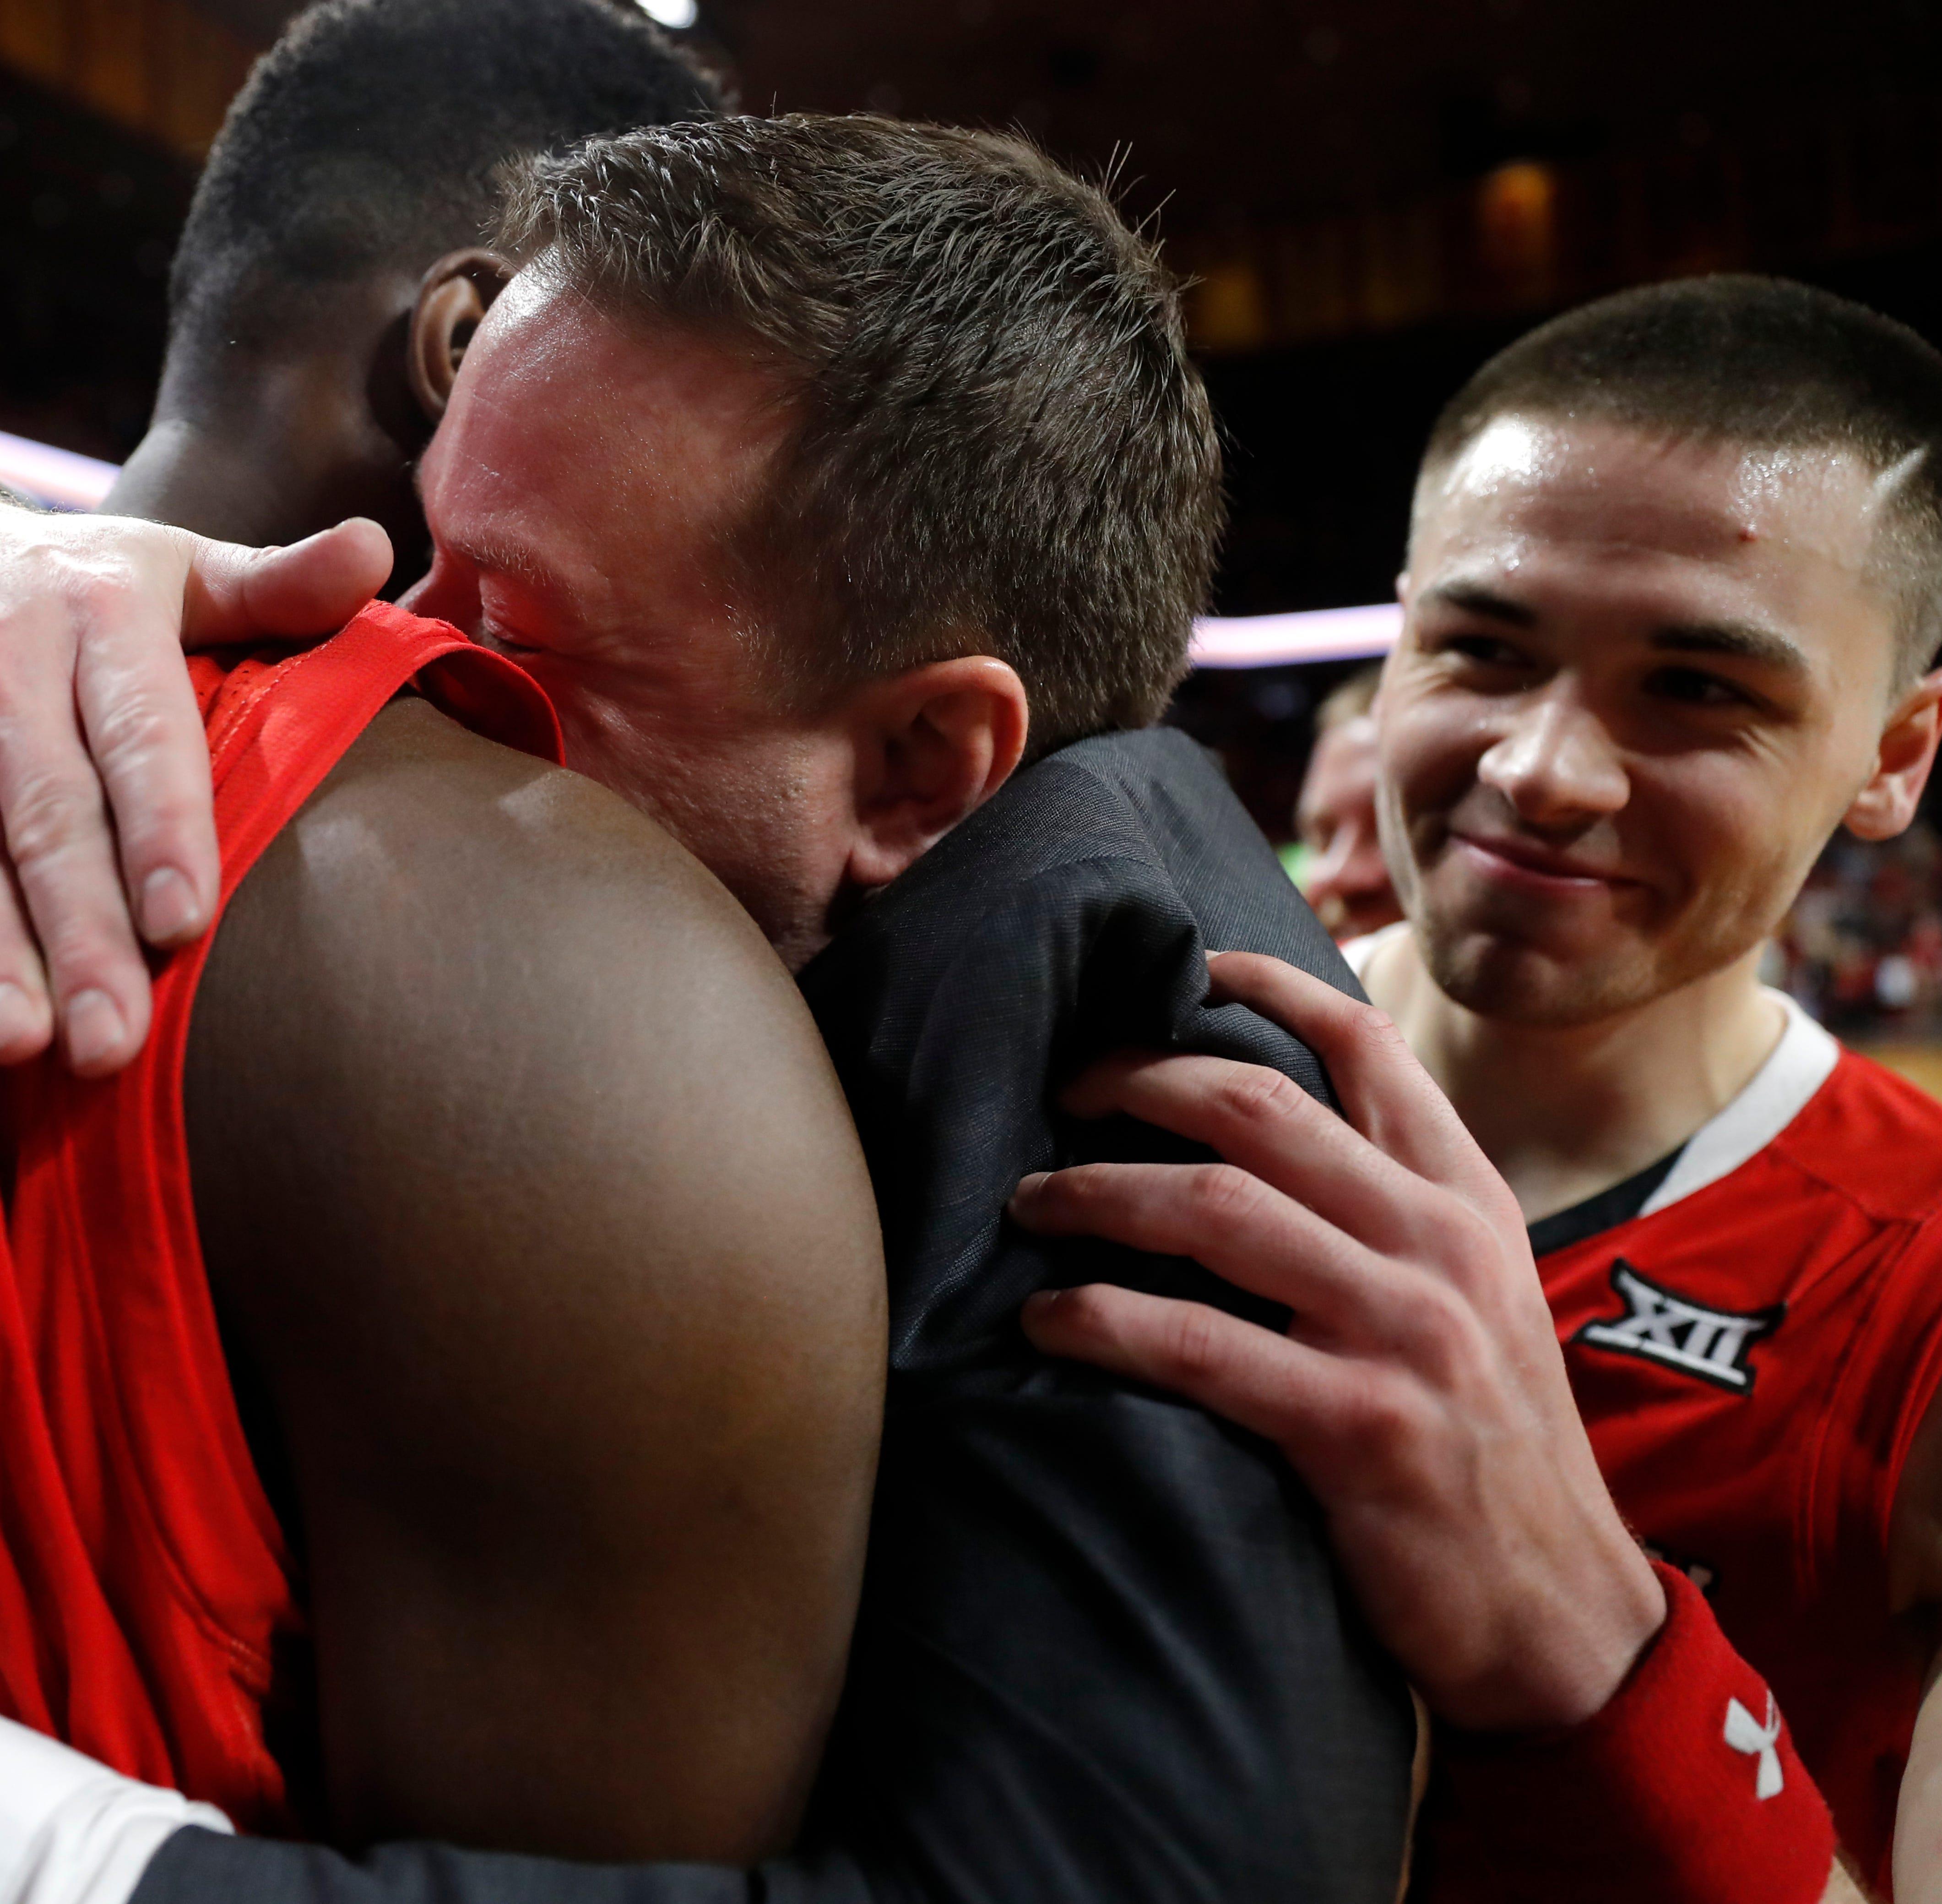 Texas Tech leaves Iowa State as Big 12 champions